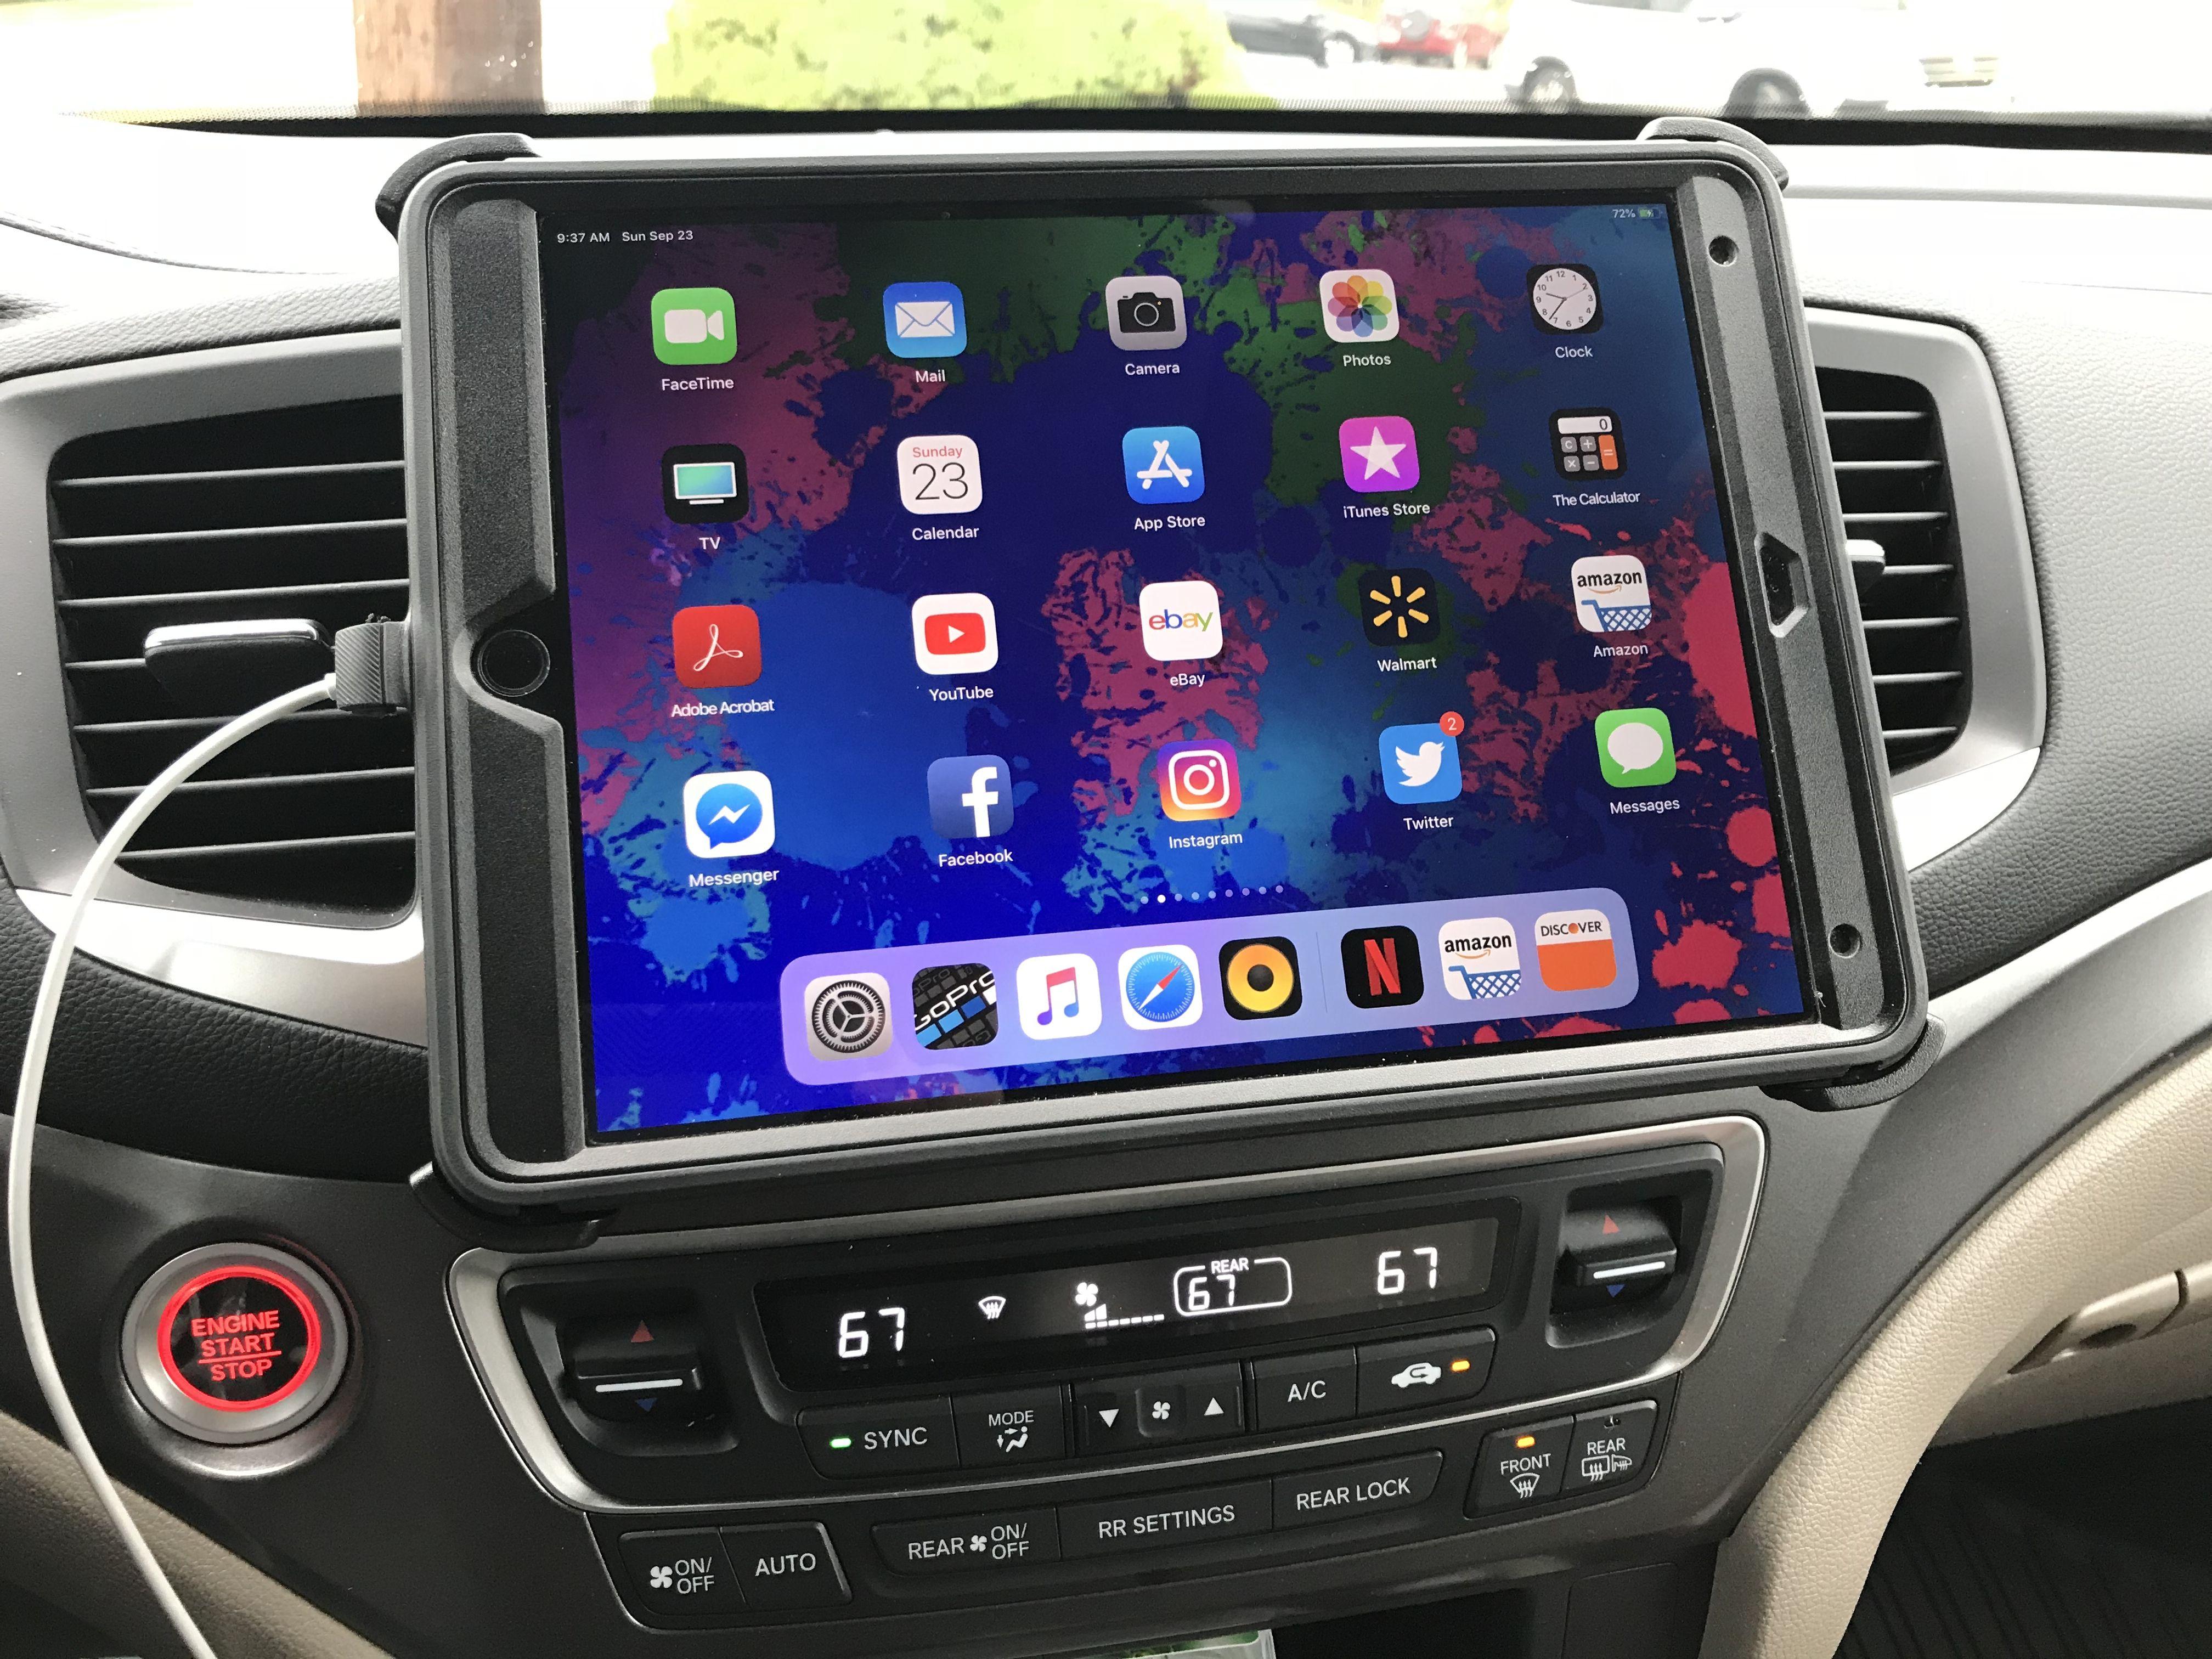 Ipad pro dash mount on honda pilot 2017 using otterbox